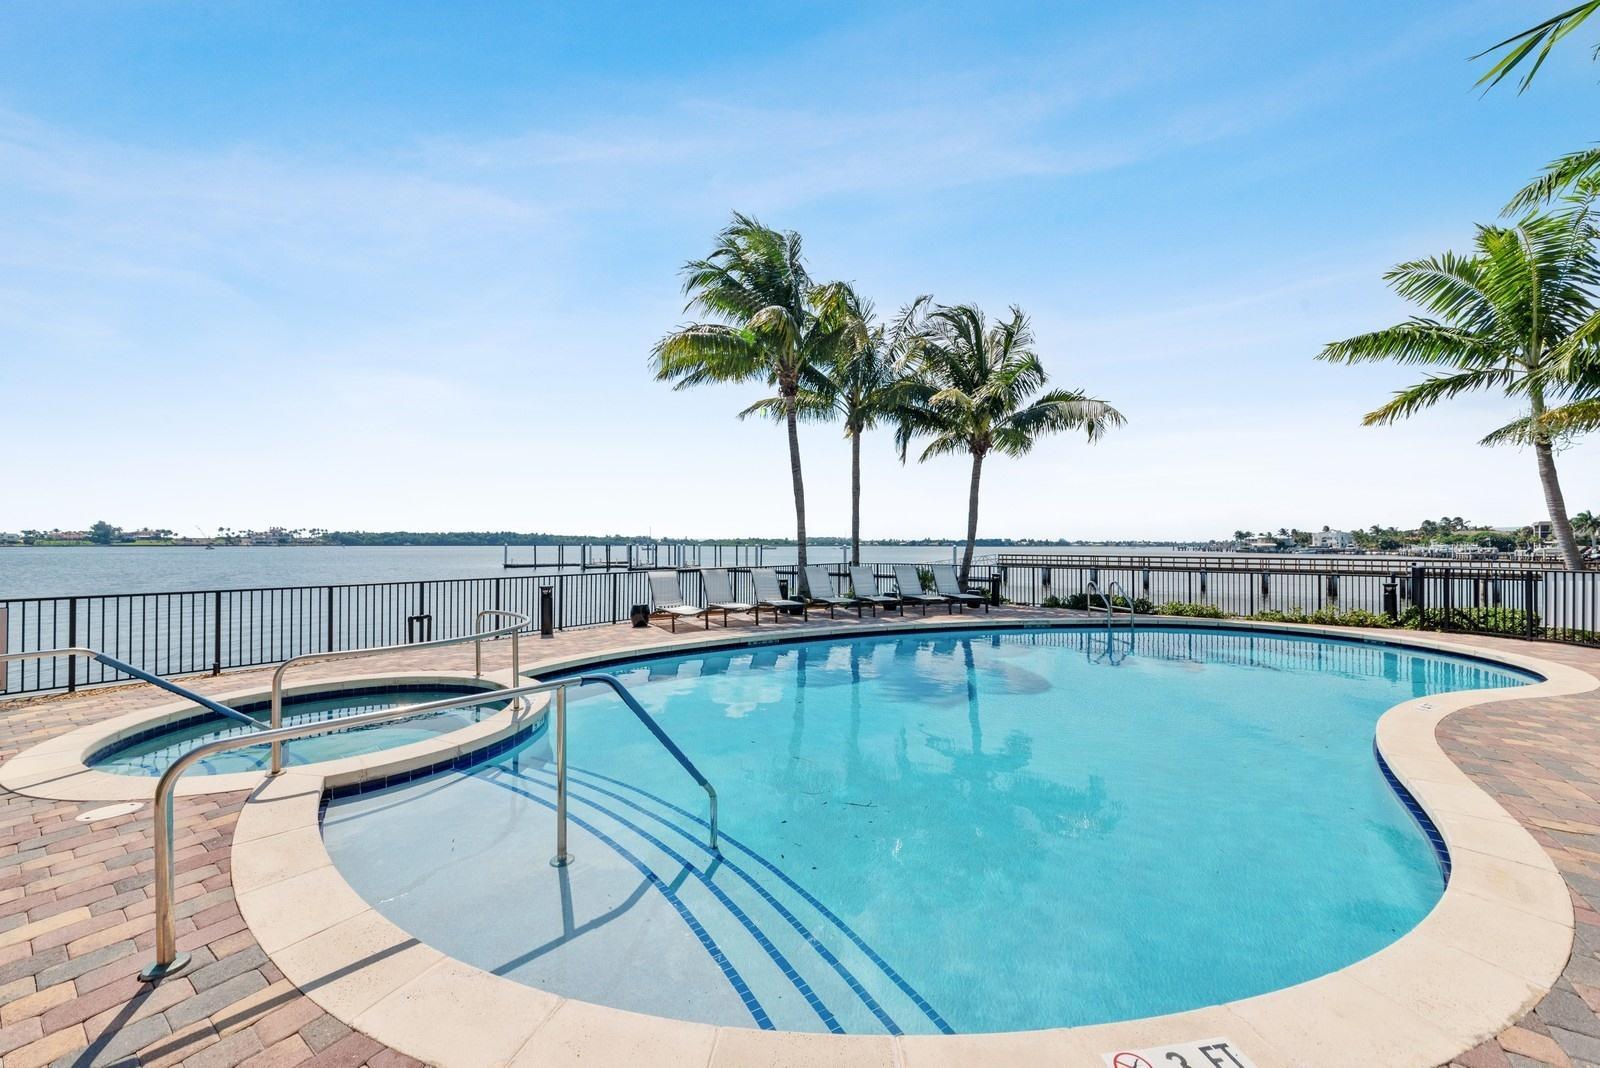 PENINSULA ON THE INTRACOASTAL BOYNTON BEACH FLORIDA